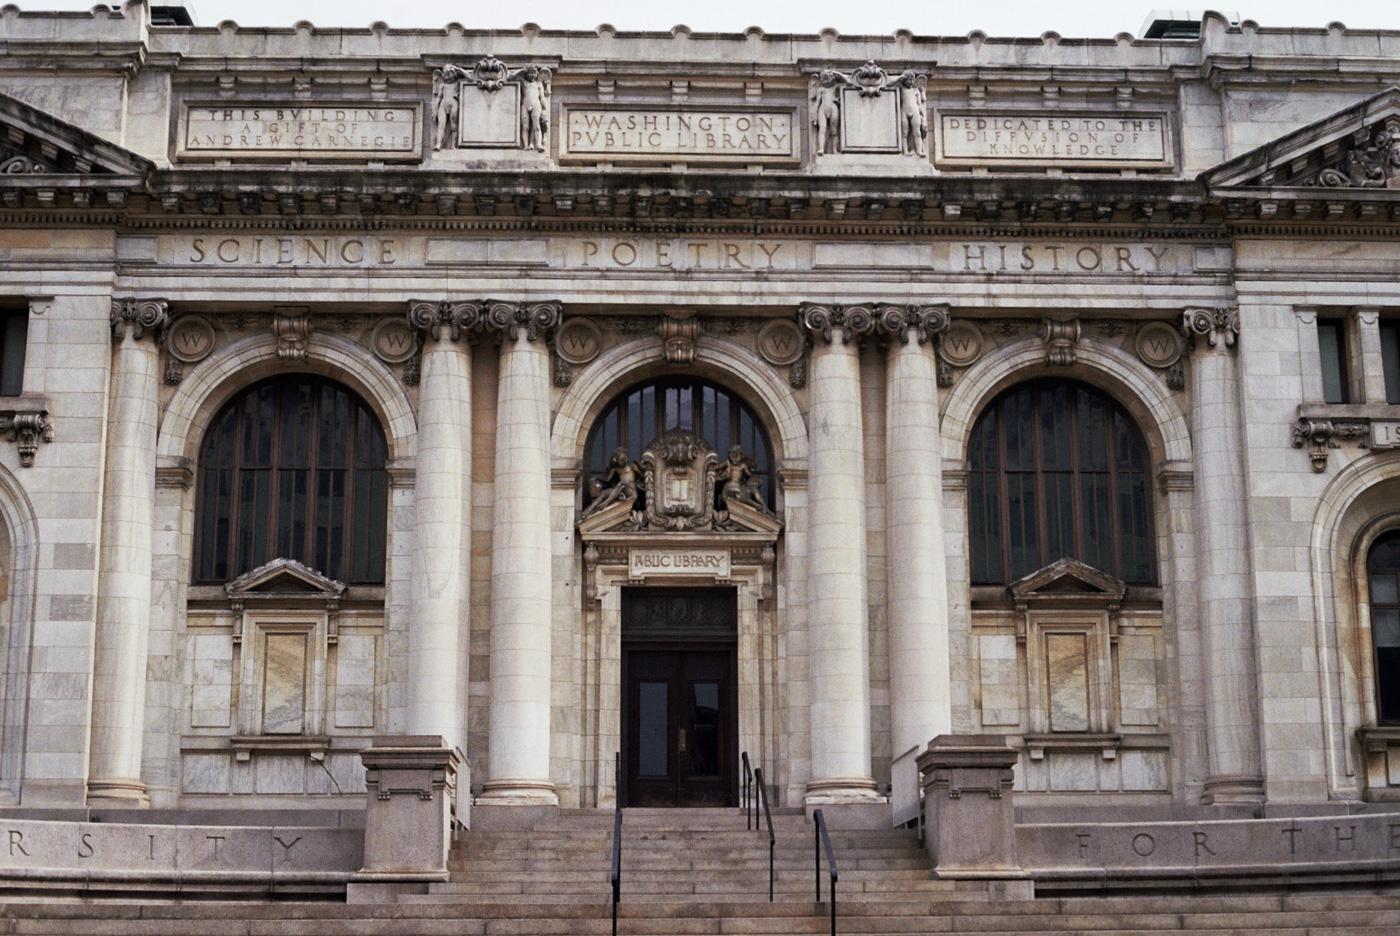 Carnegie Library at Mt. Vernon Square